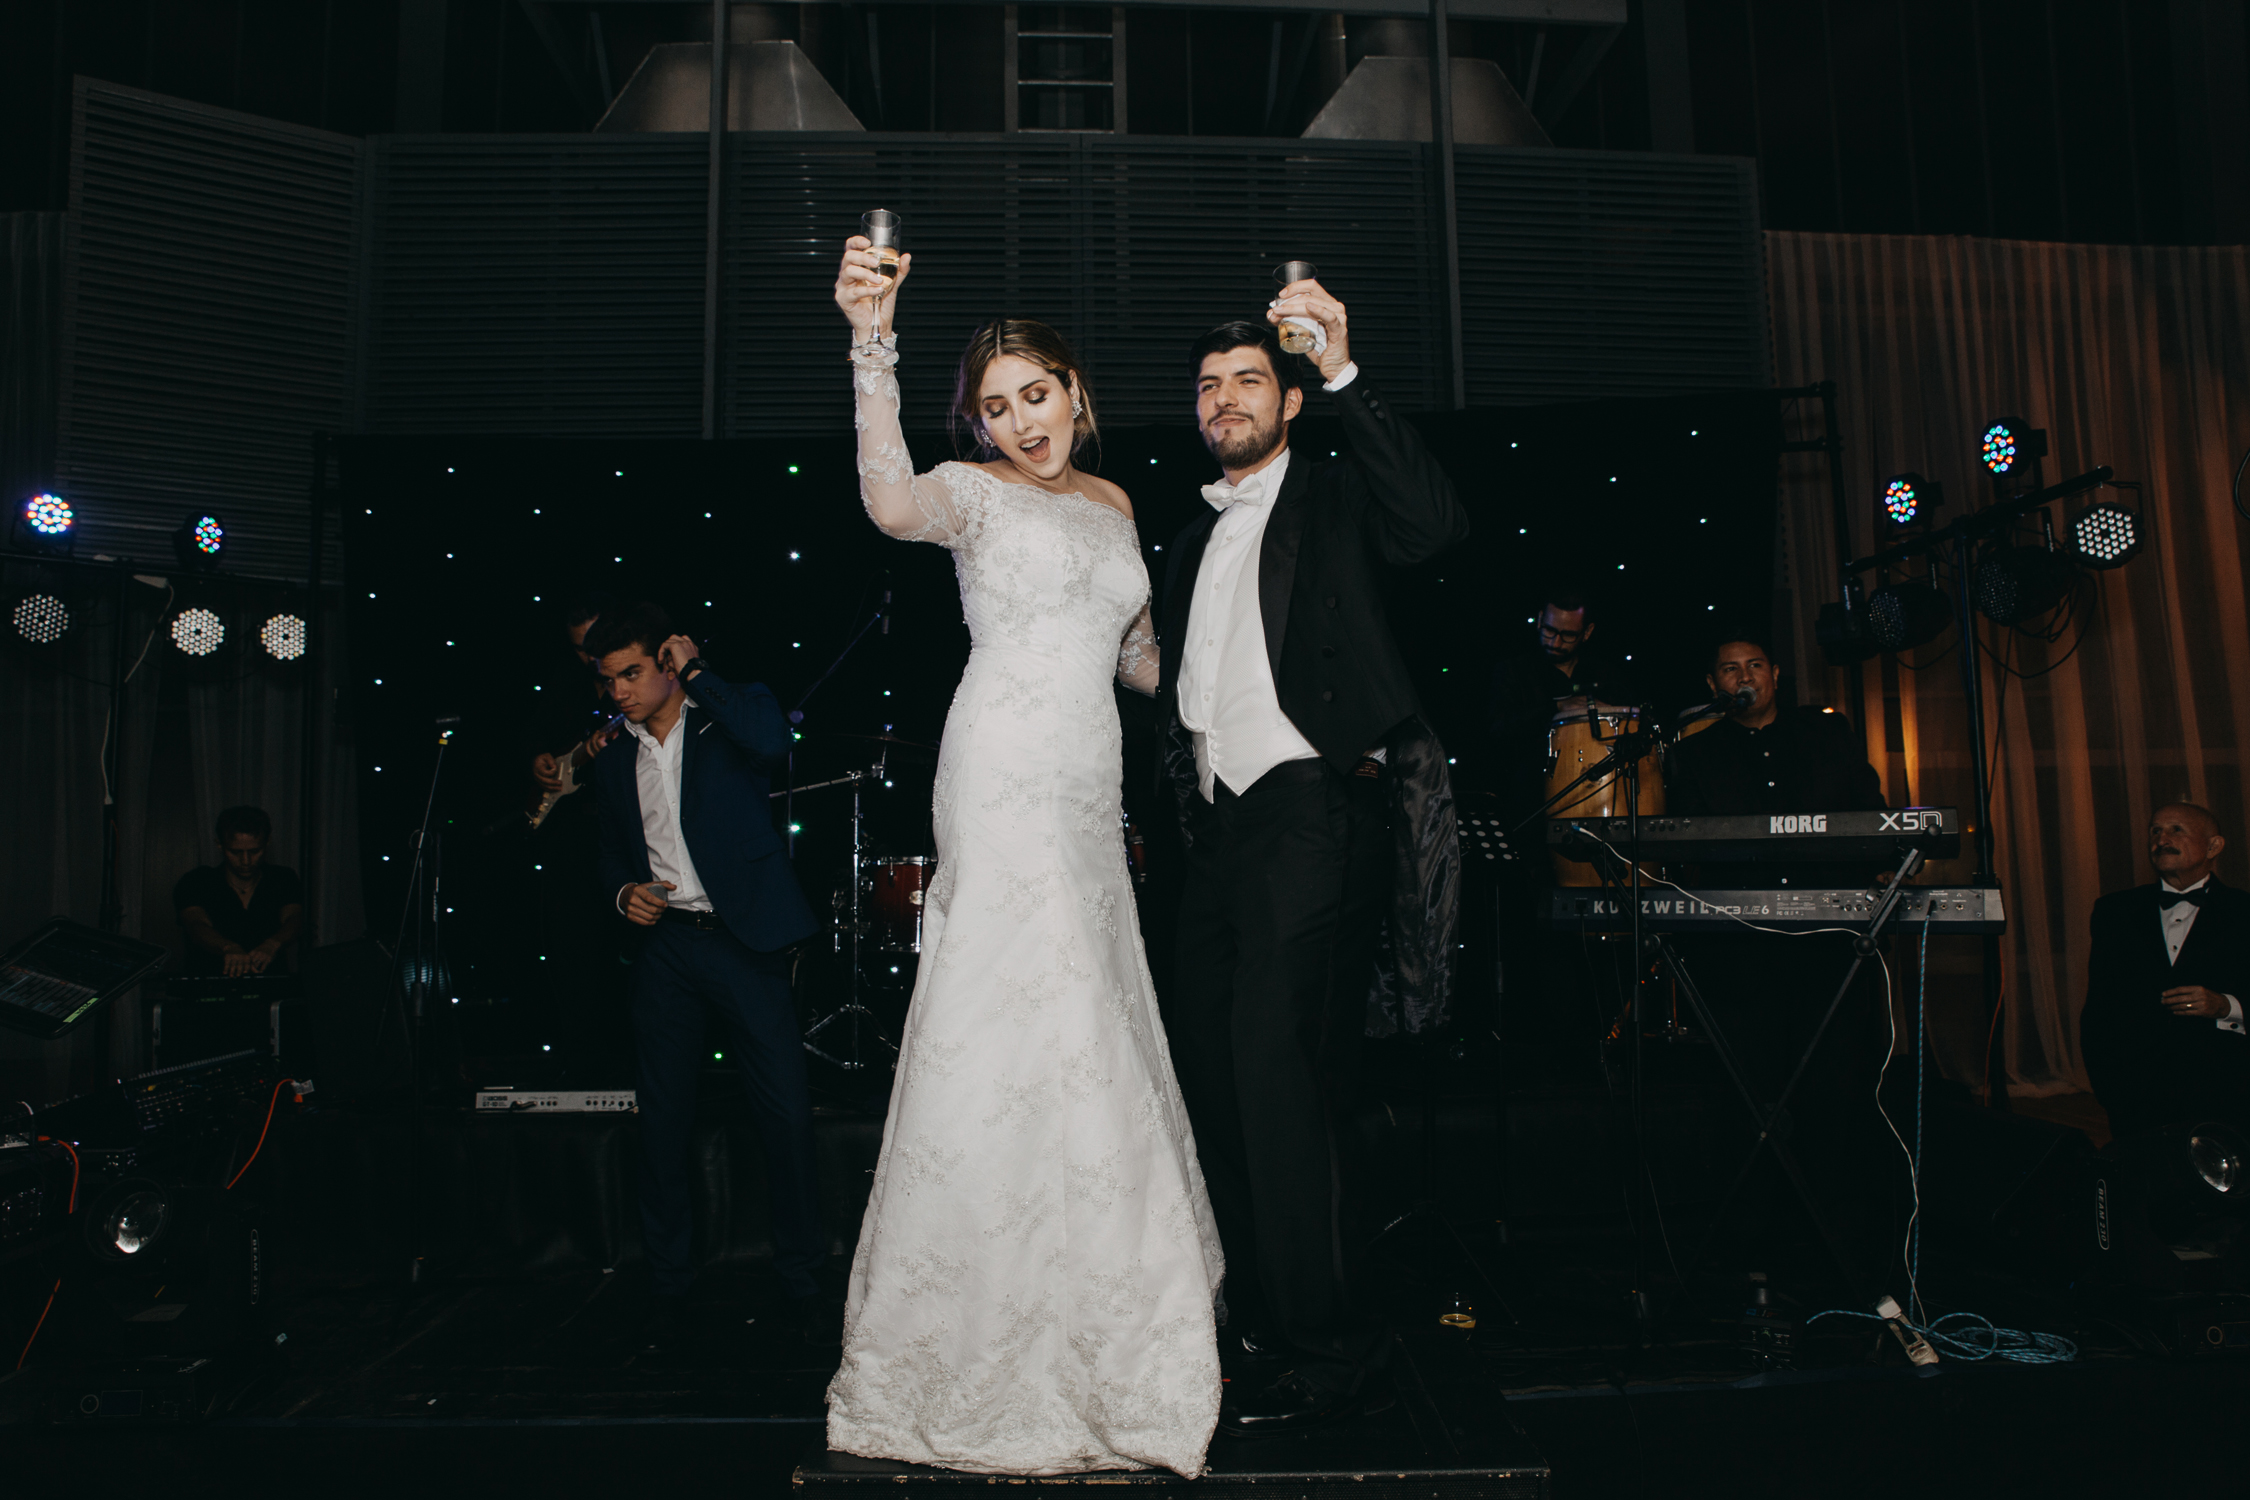 Michelle-Agurto-Fotografia-Bodas-Ecuador-Destination-Wedding-Photographer-Vicky-Javier-297.JPG